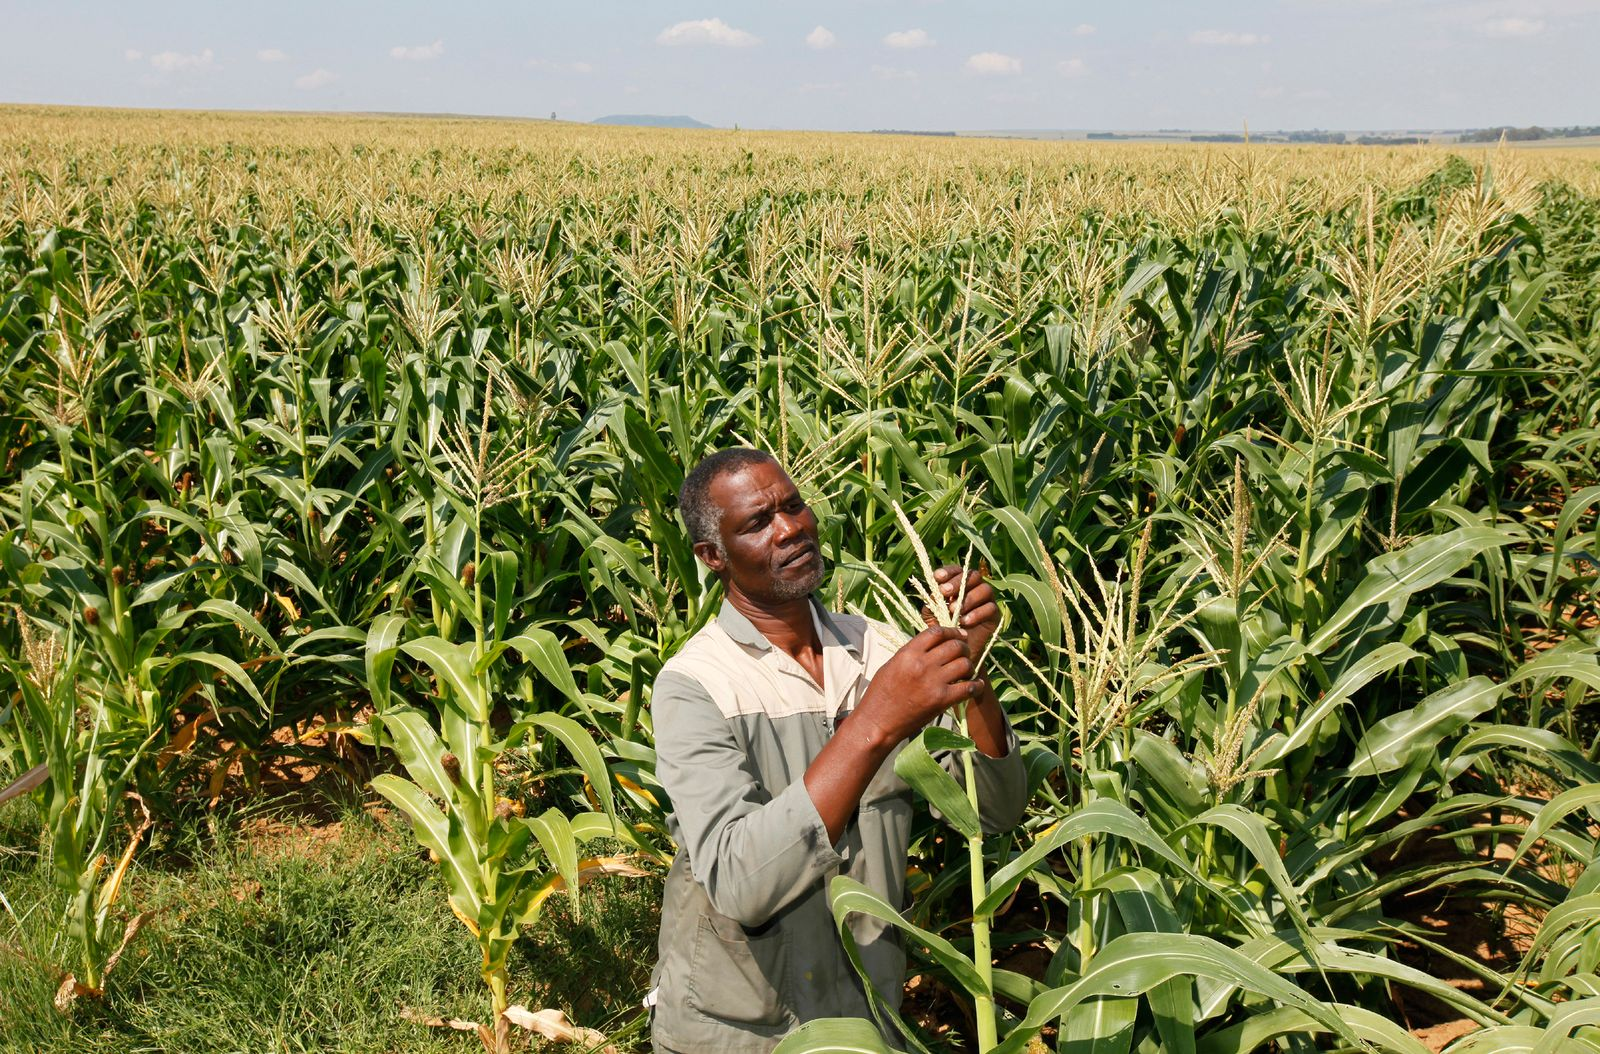 Afrika / Bauern / EU-Export / Farm